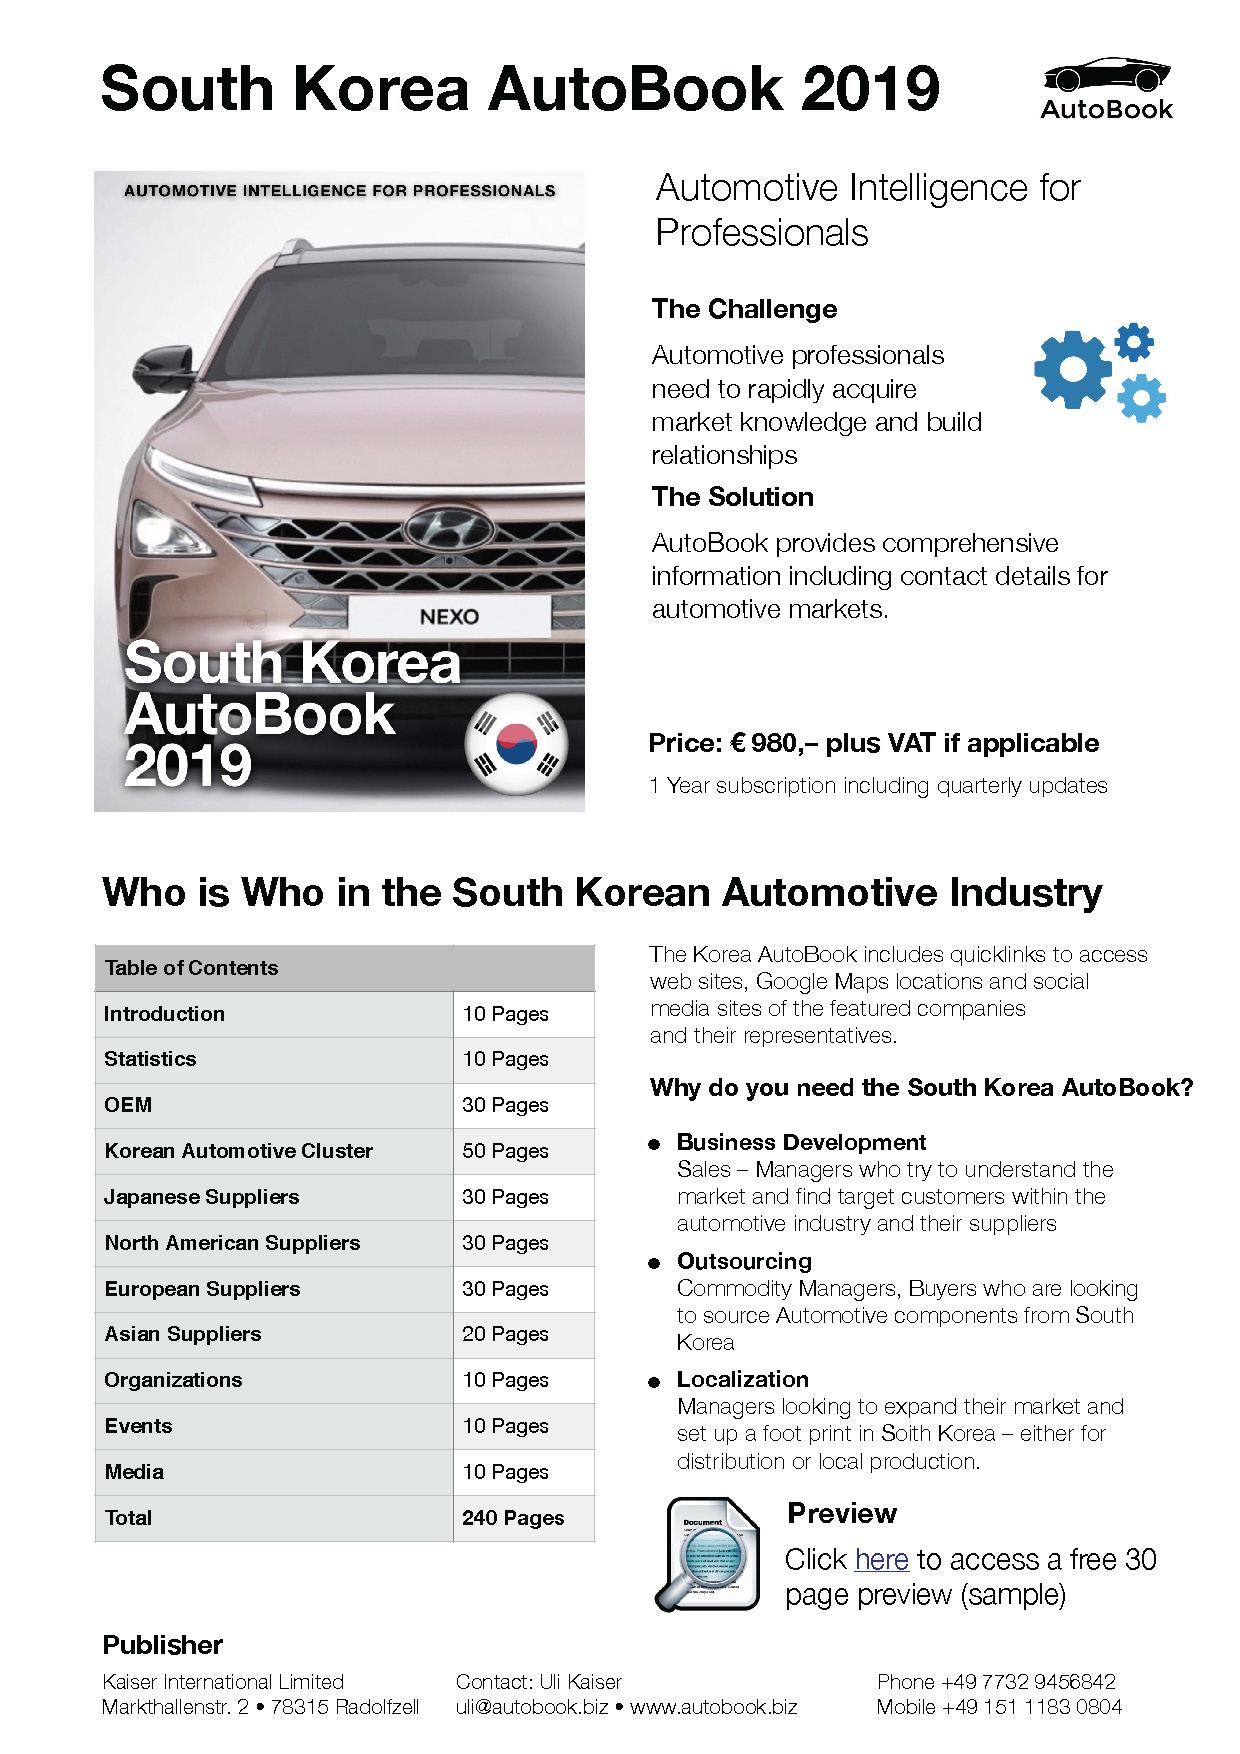 South Korea AutoBook 2019 Datasheet.jpg